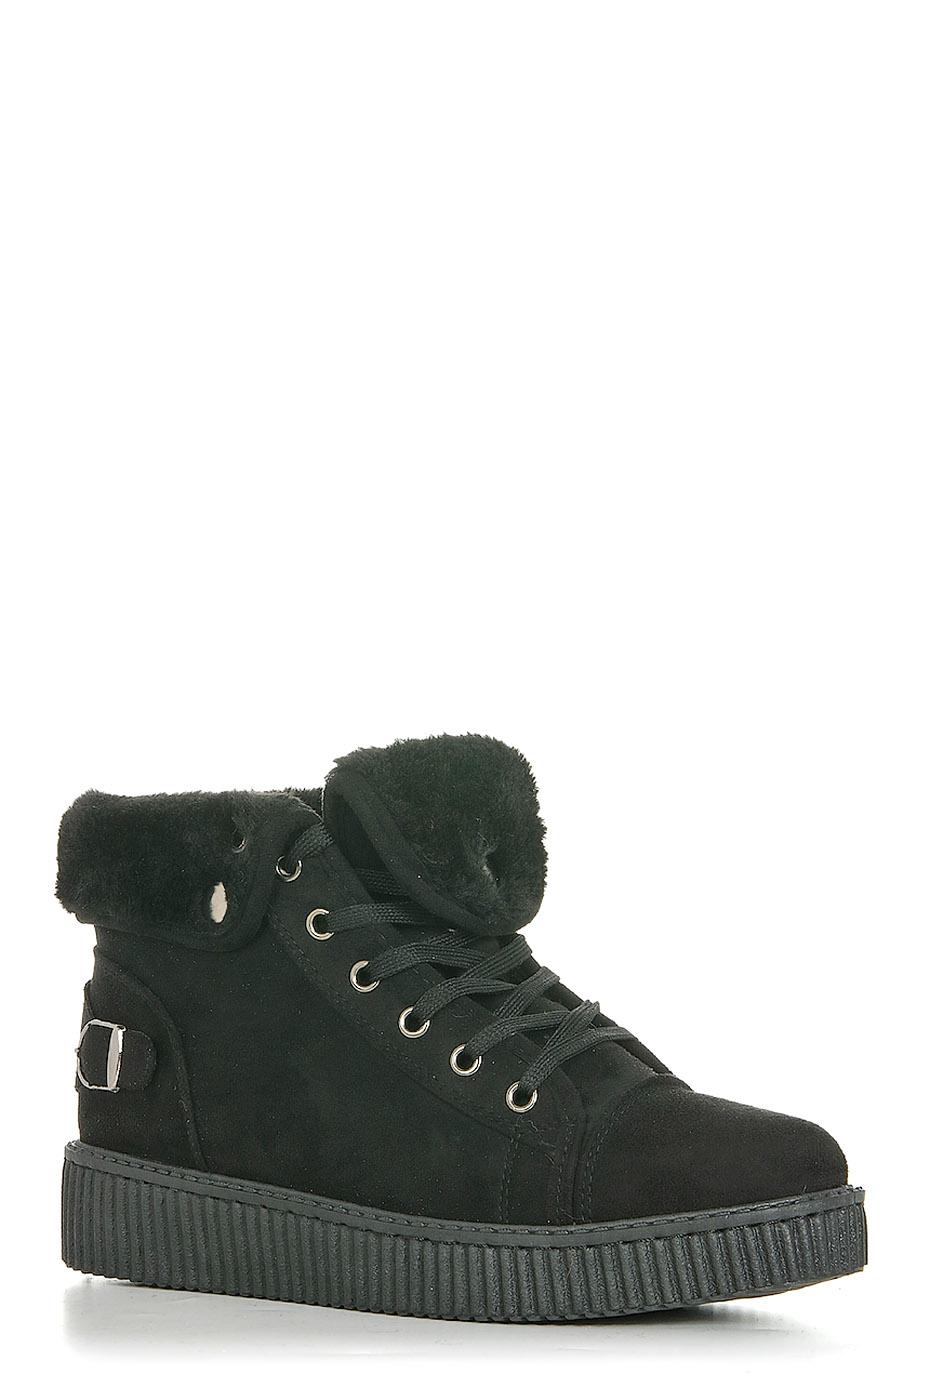 Ботинки TOPLAND2352-PB72510B/BLACK